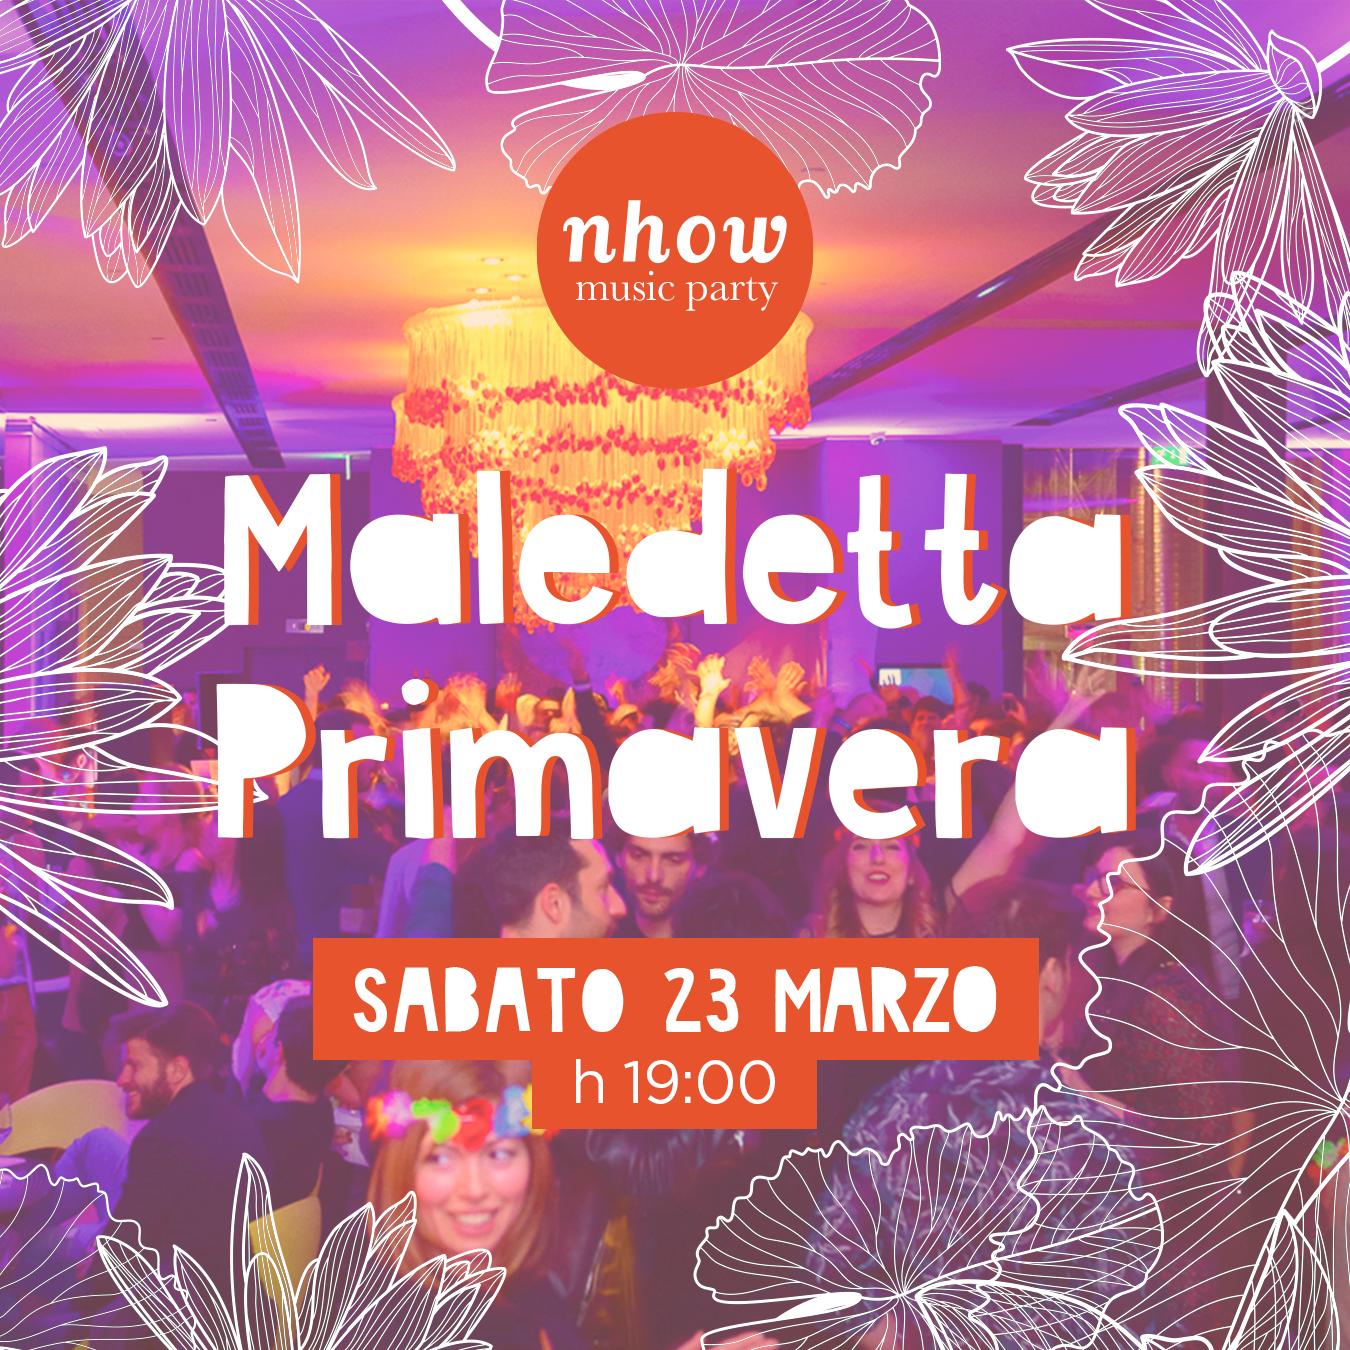 Hotel Cocktail Party - Maledetta Primavera / Spring Party nhow milano